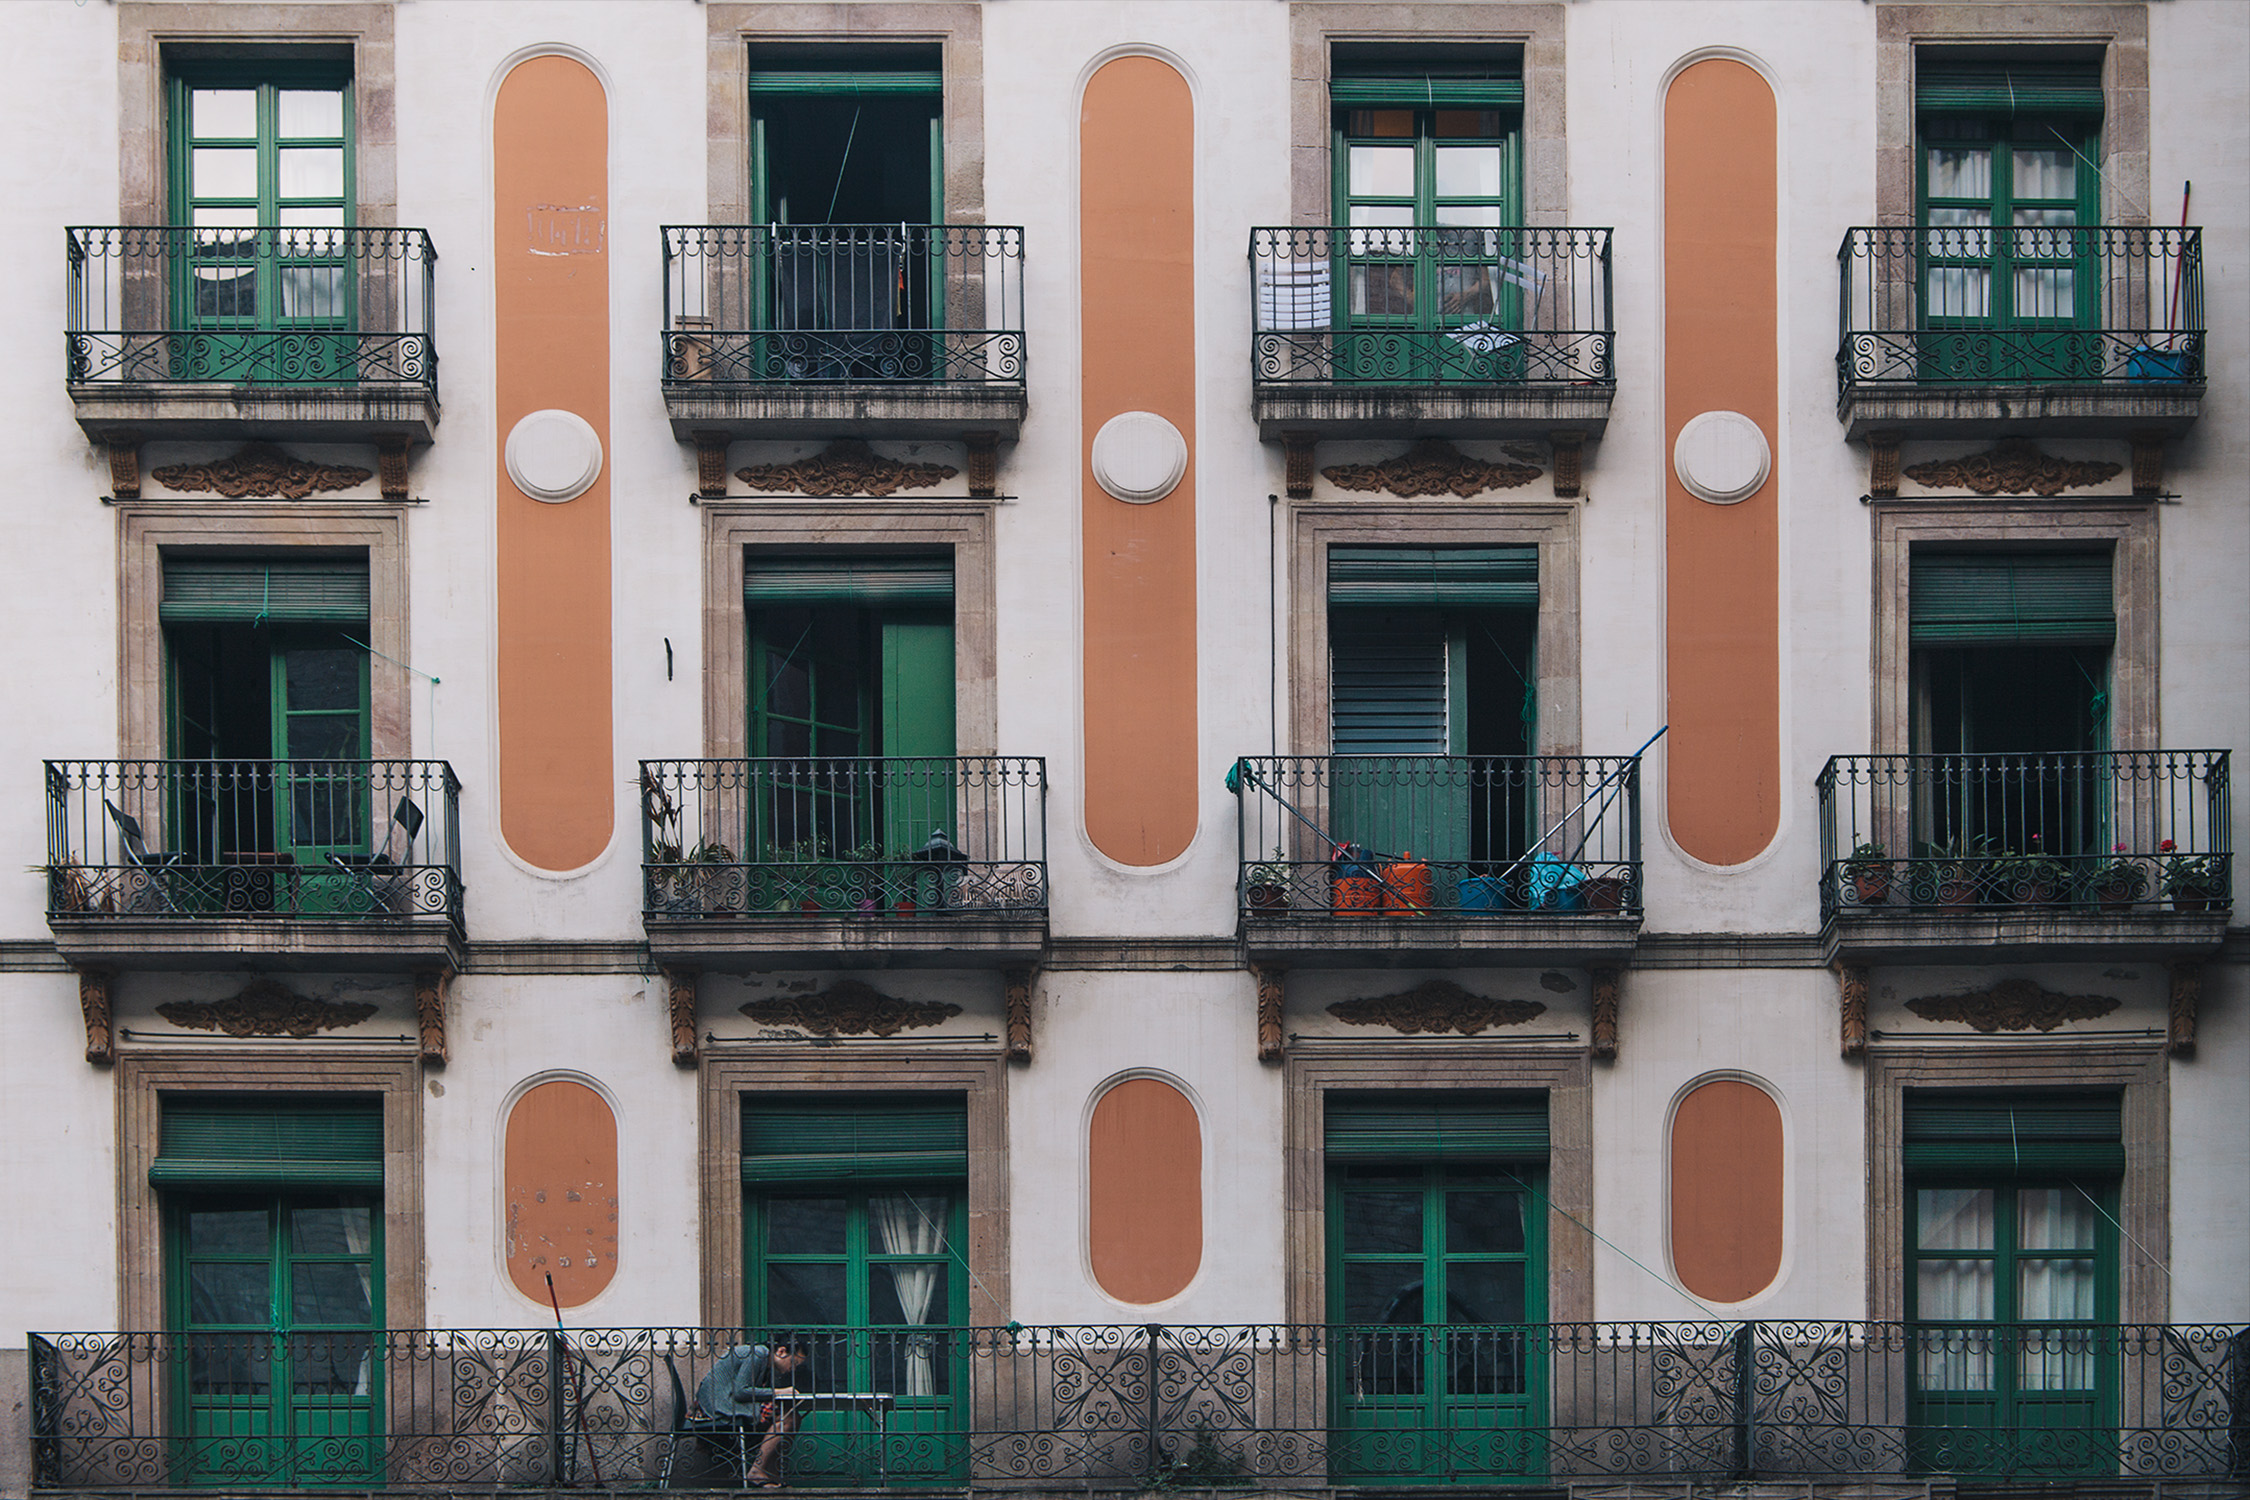 lifestyle-editorial-travel-washington-dc-malek-naz-photography-barcelona-spain-balcony.jpg